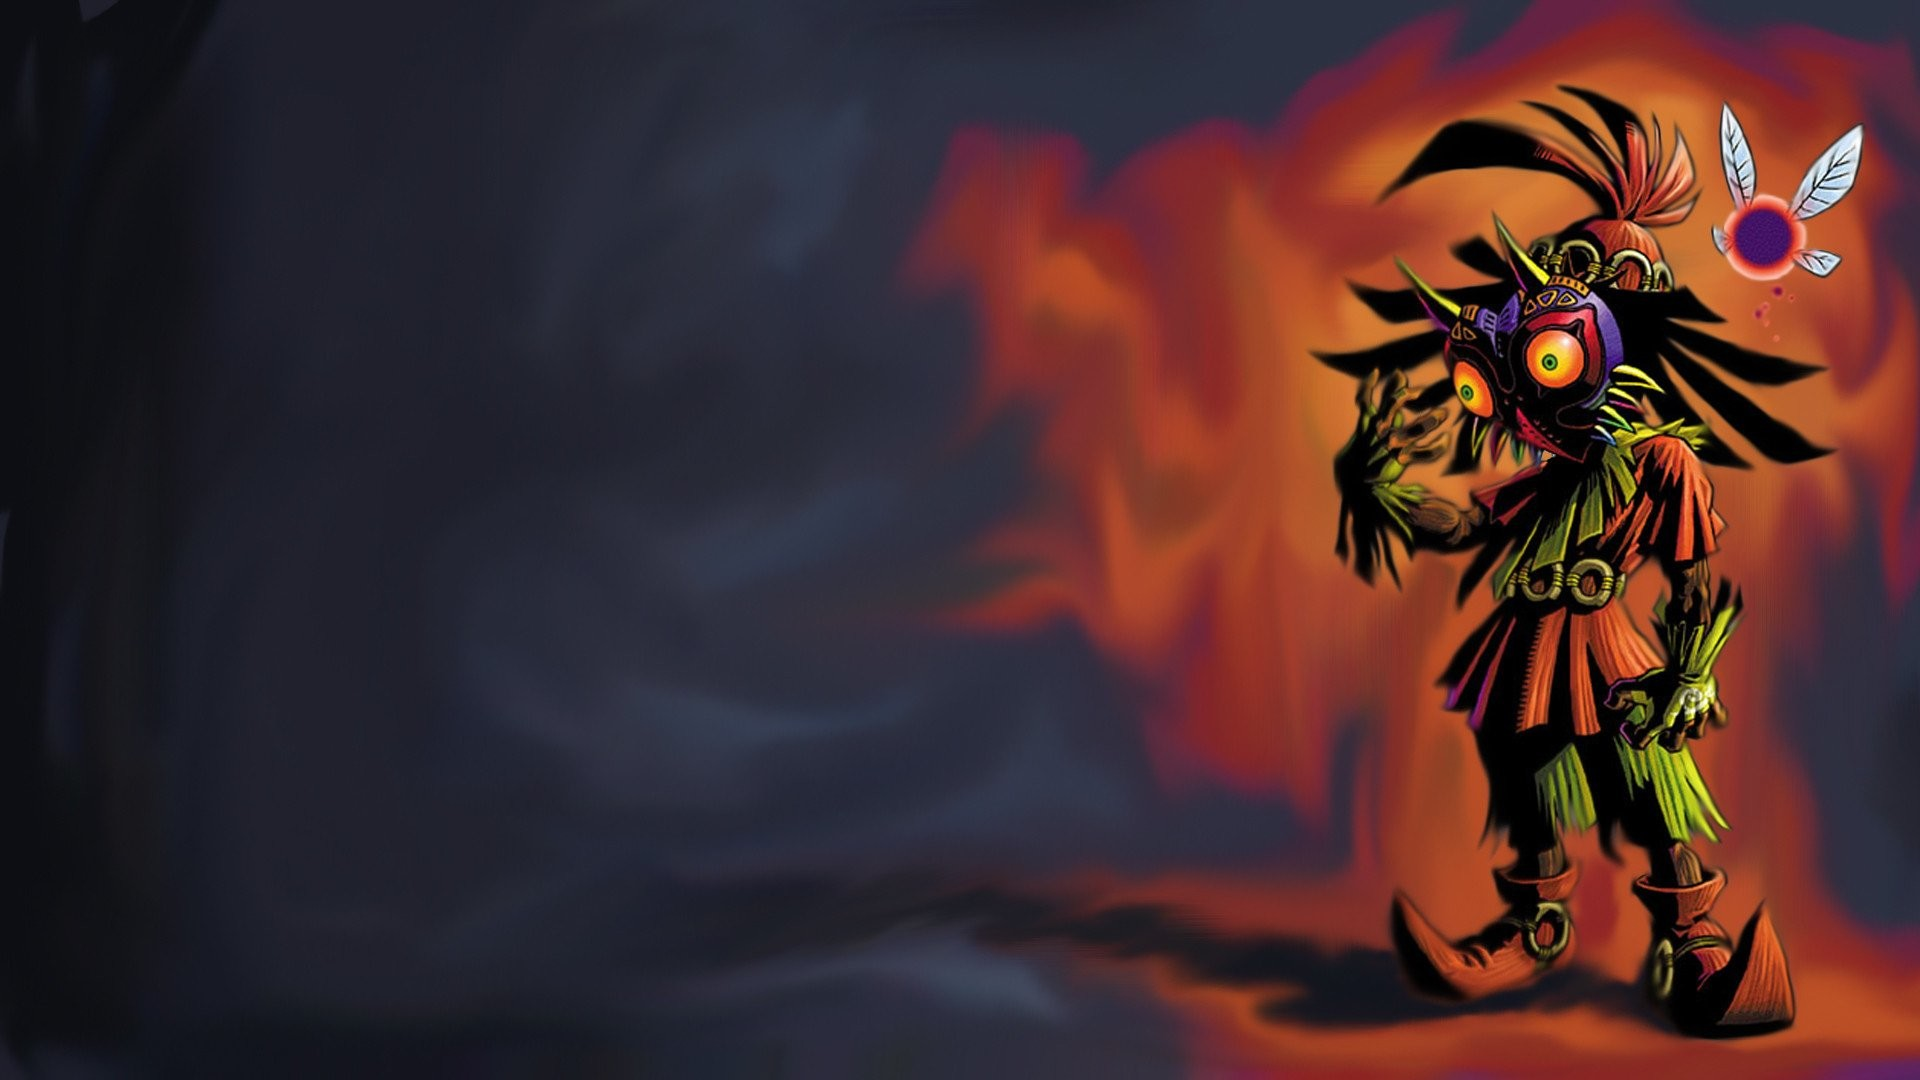 Video Game – The Legend Of Zelda: Majora's Mask Wallpaper